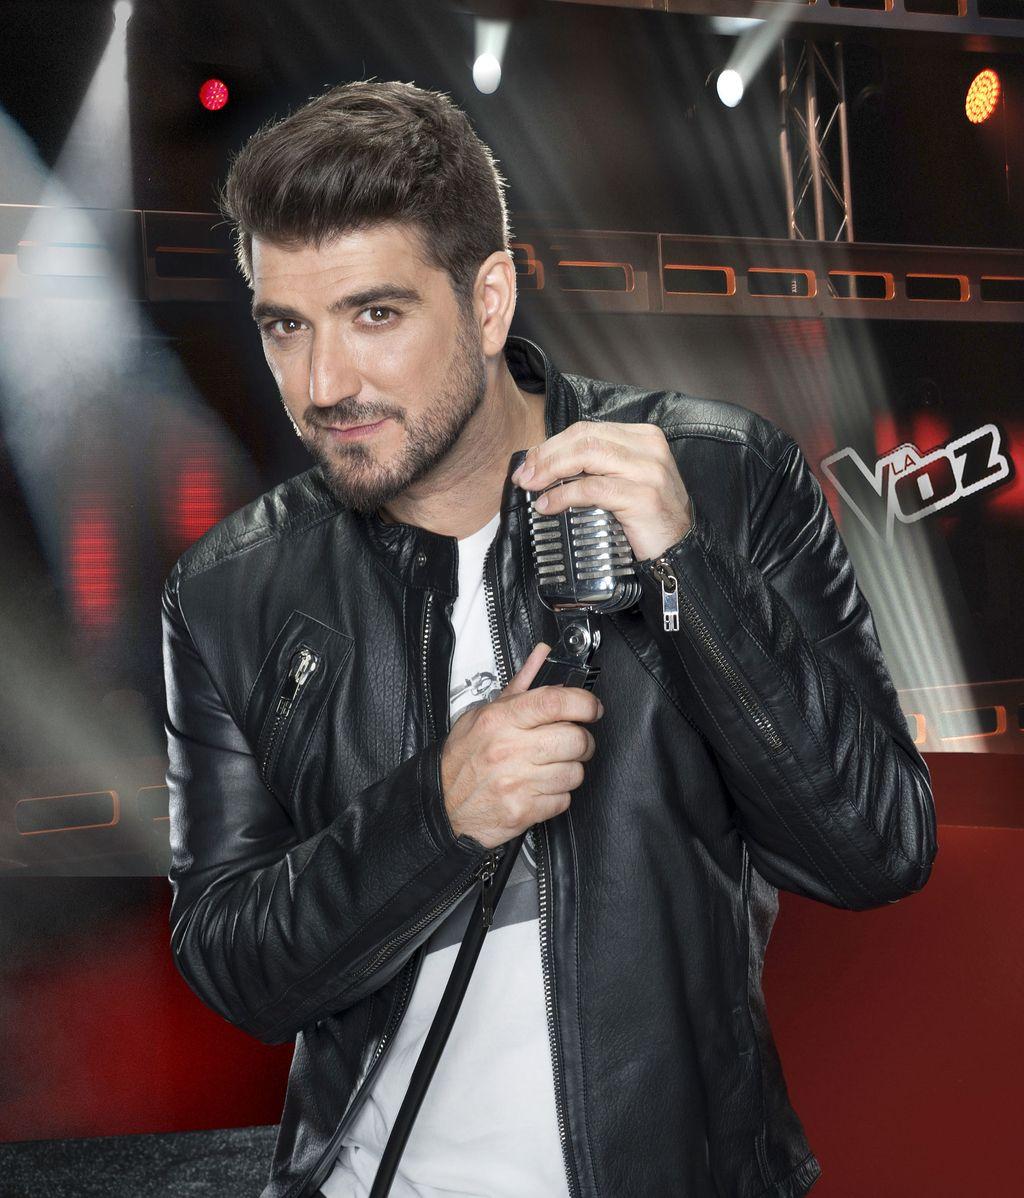 Antonio Orozco en La voz